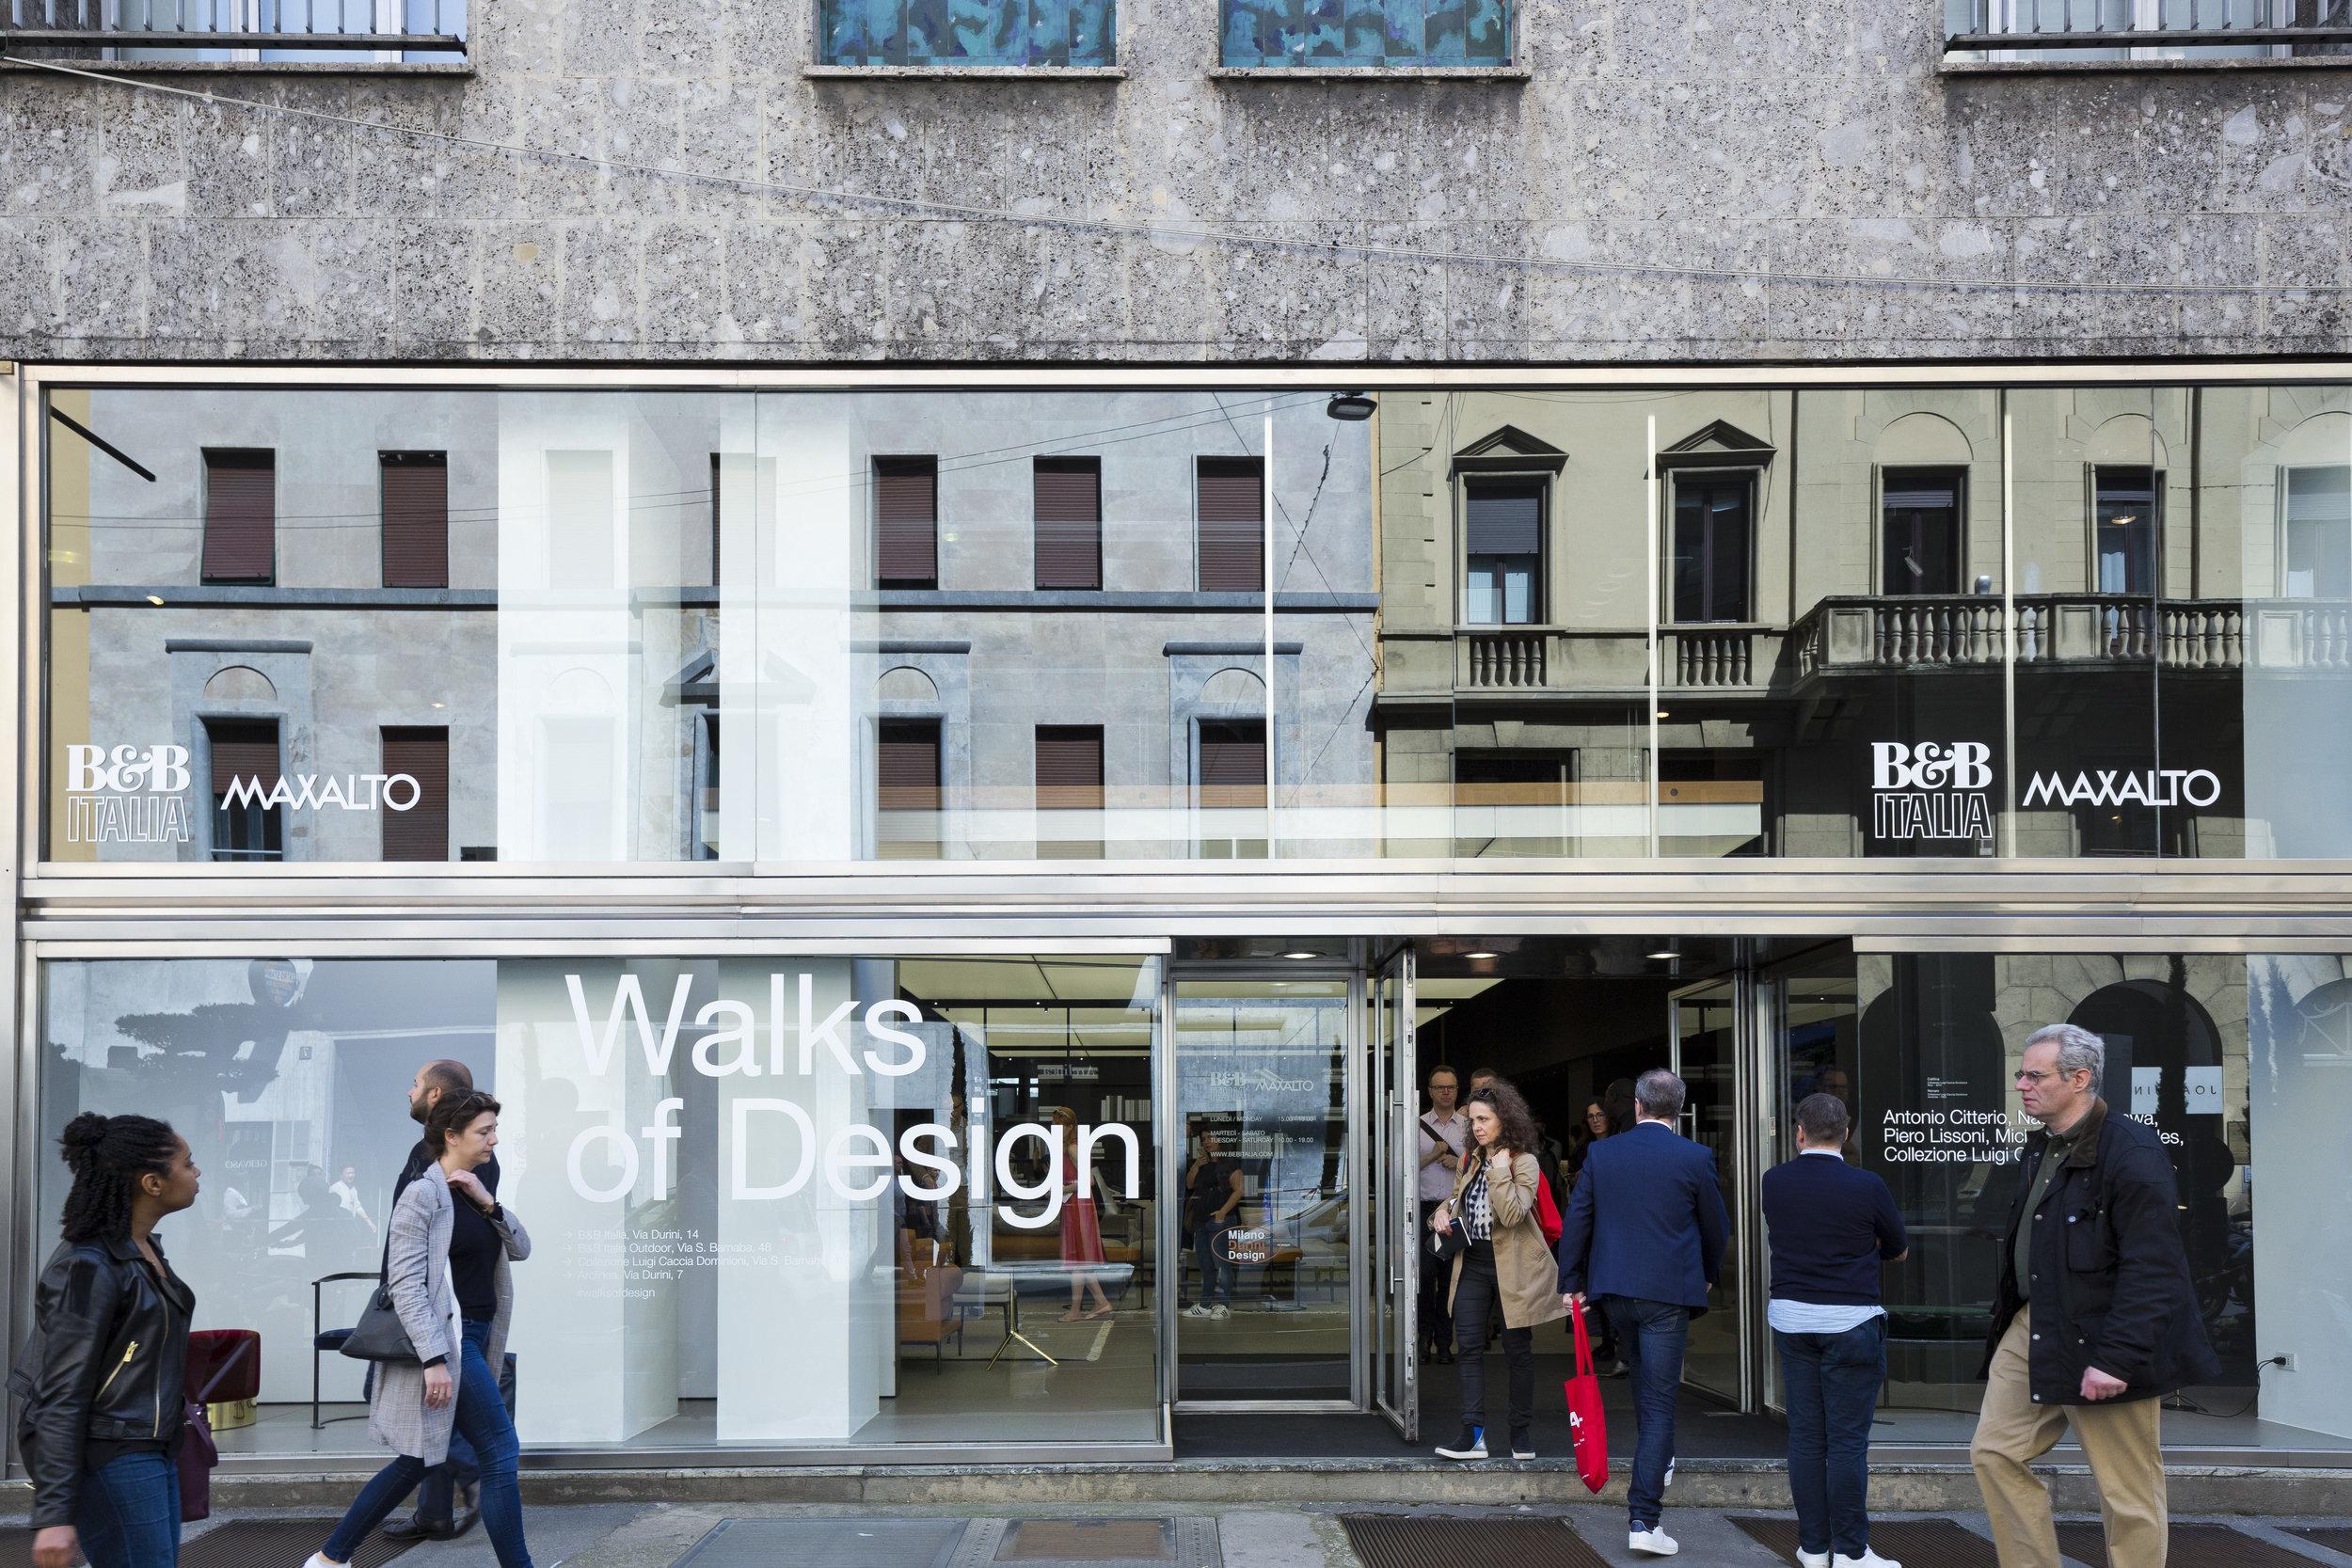 'Walks of Design' exhibition at B&B Italia on Via Durini, featuring new designs by Antonio Citterio, Naoto Fukasawa, Piero Lissoni and Michael Anastassiades.